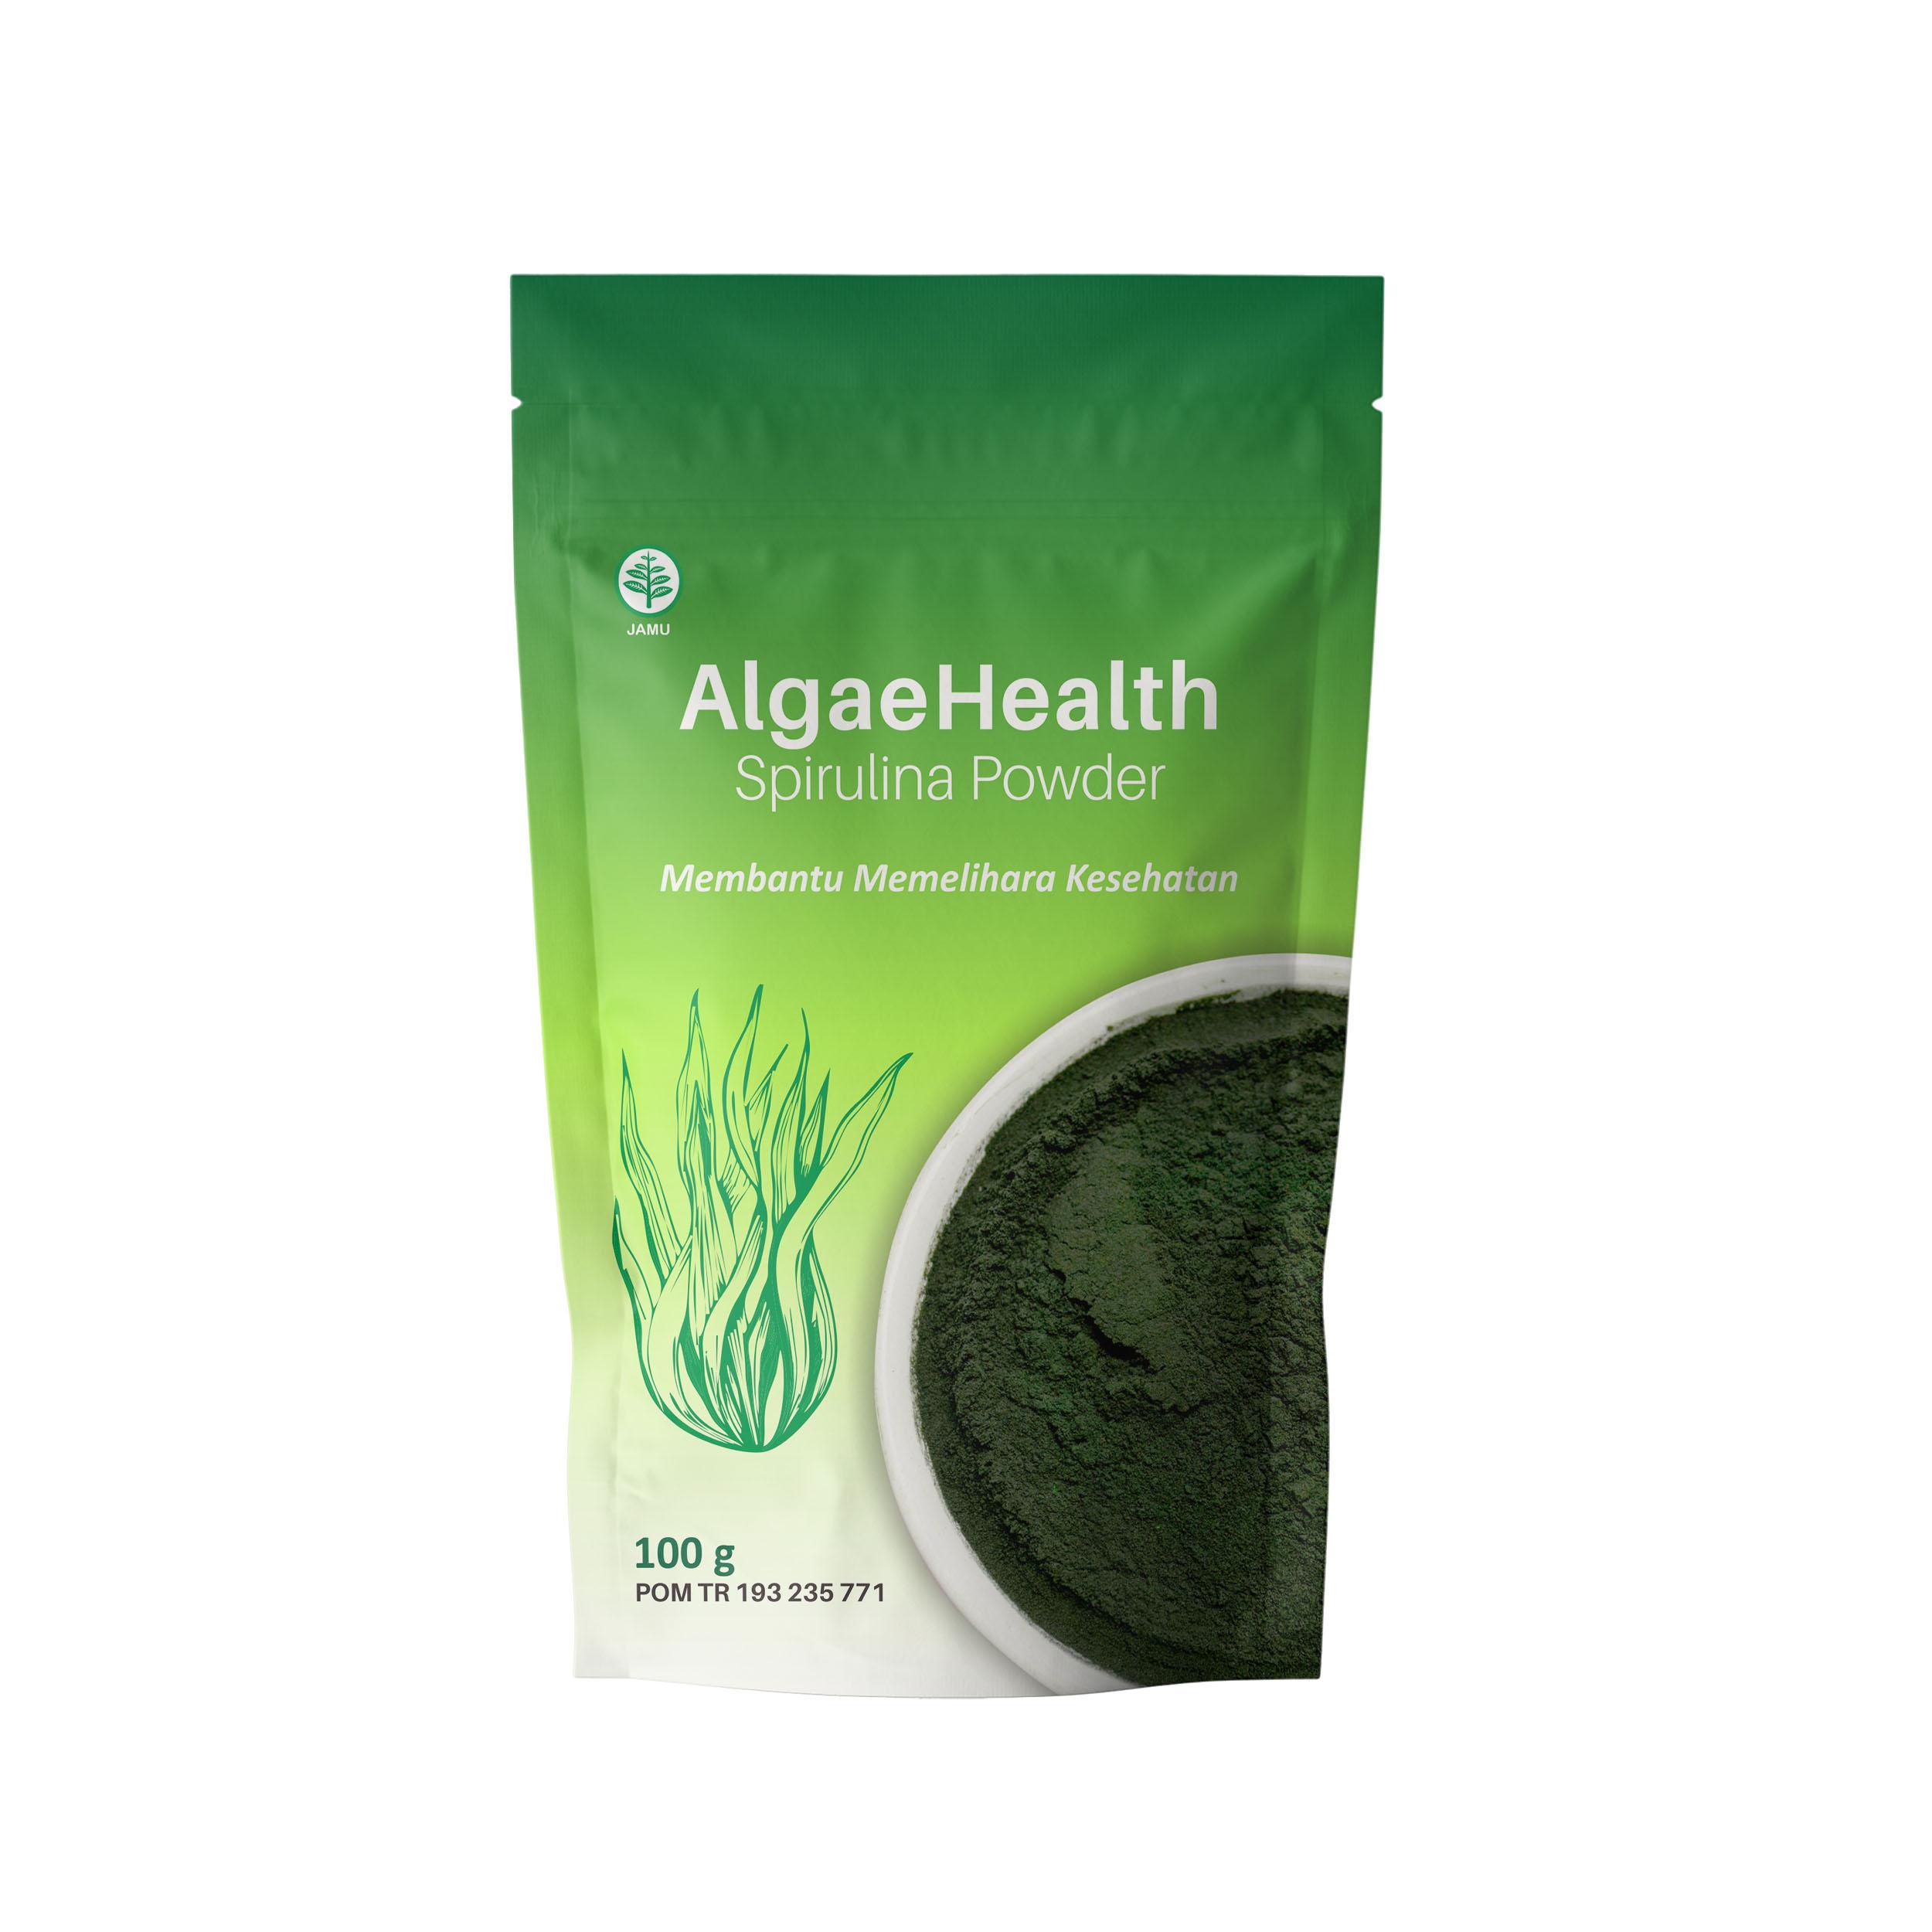 Algaehealth